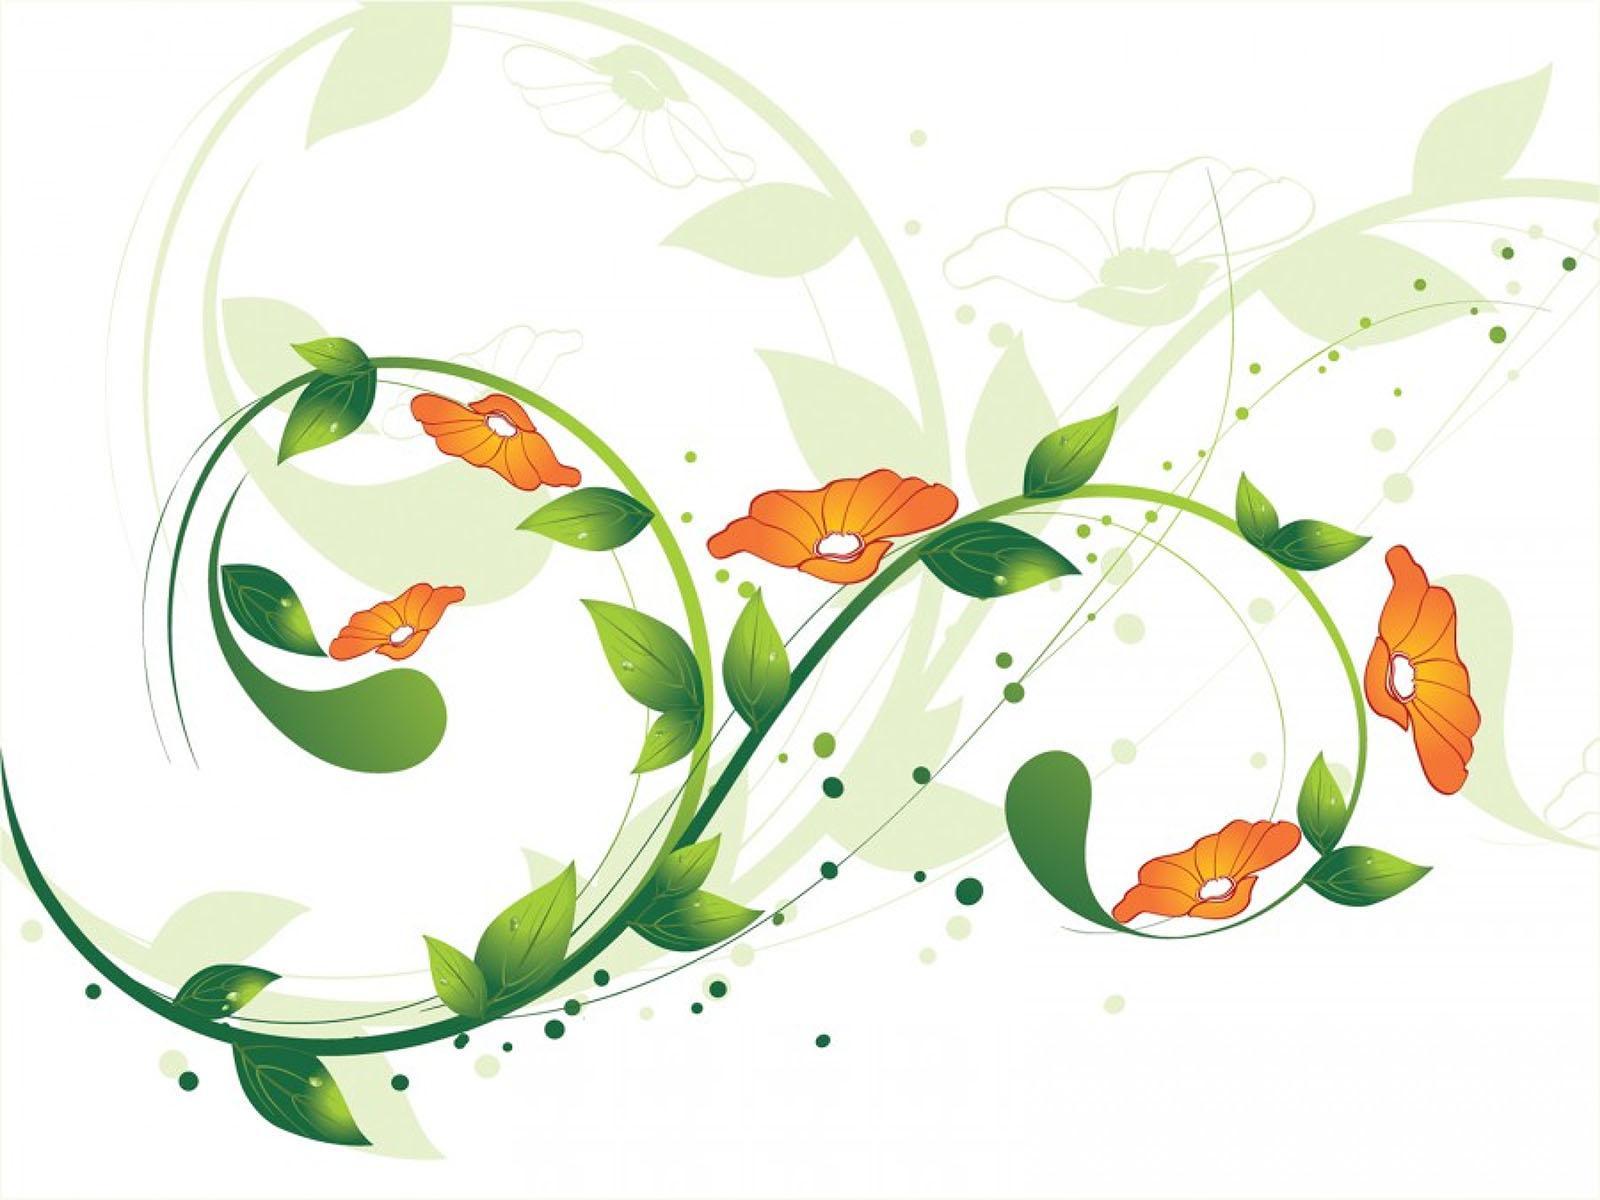 Green Flower Swirls PPT Backgrounds